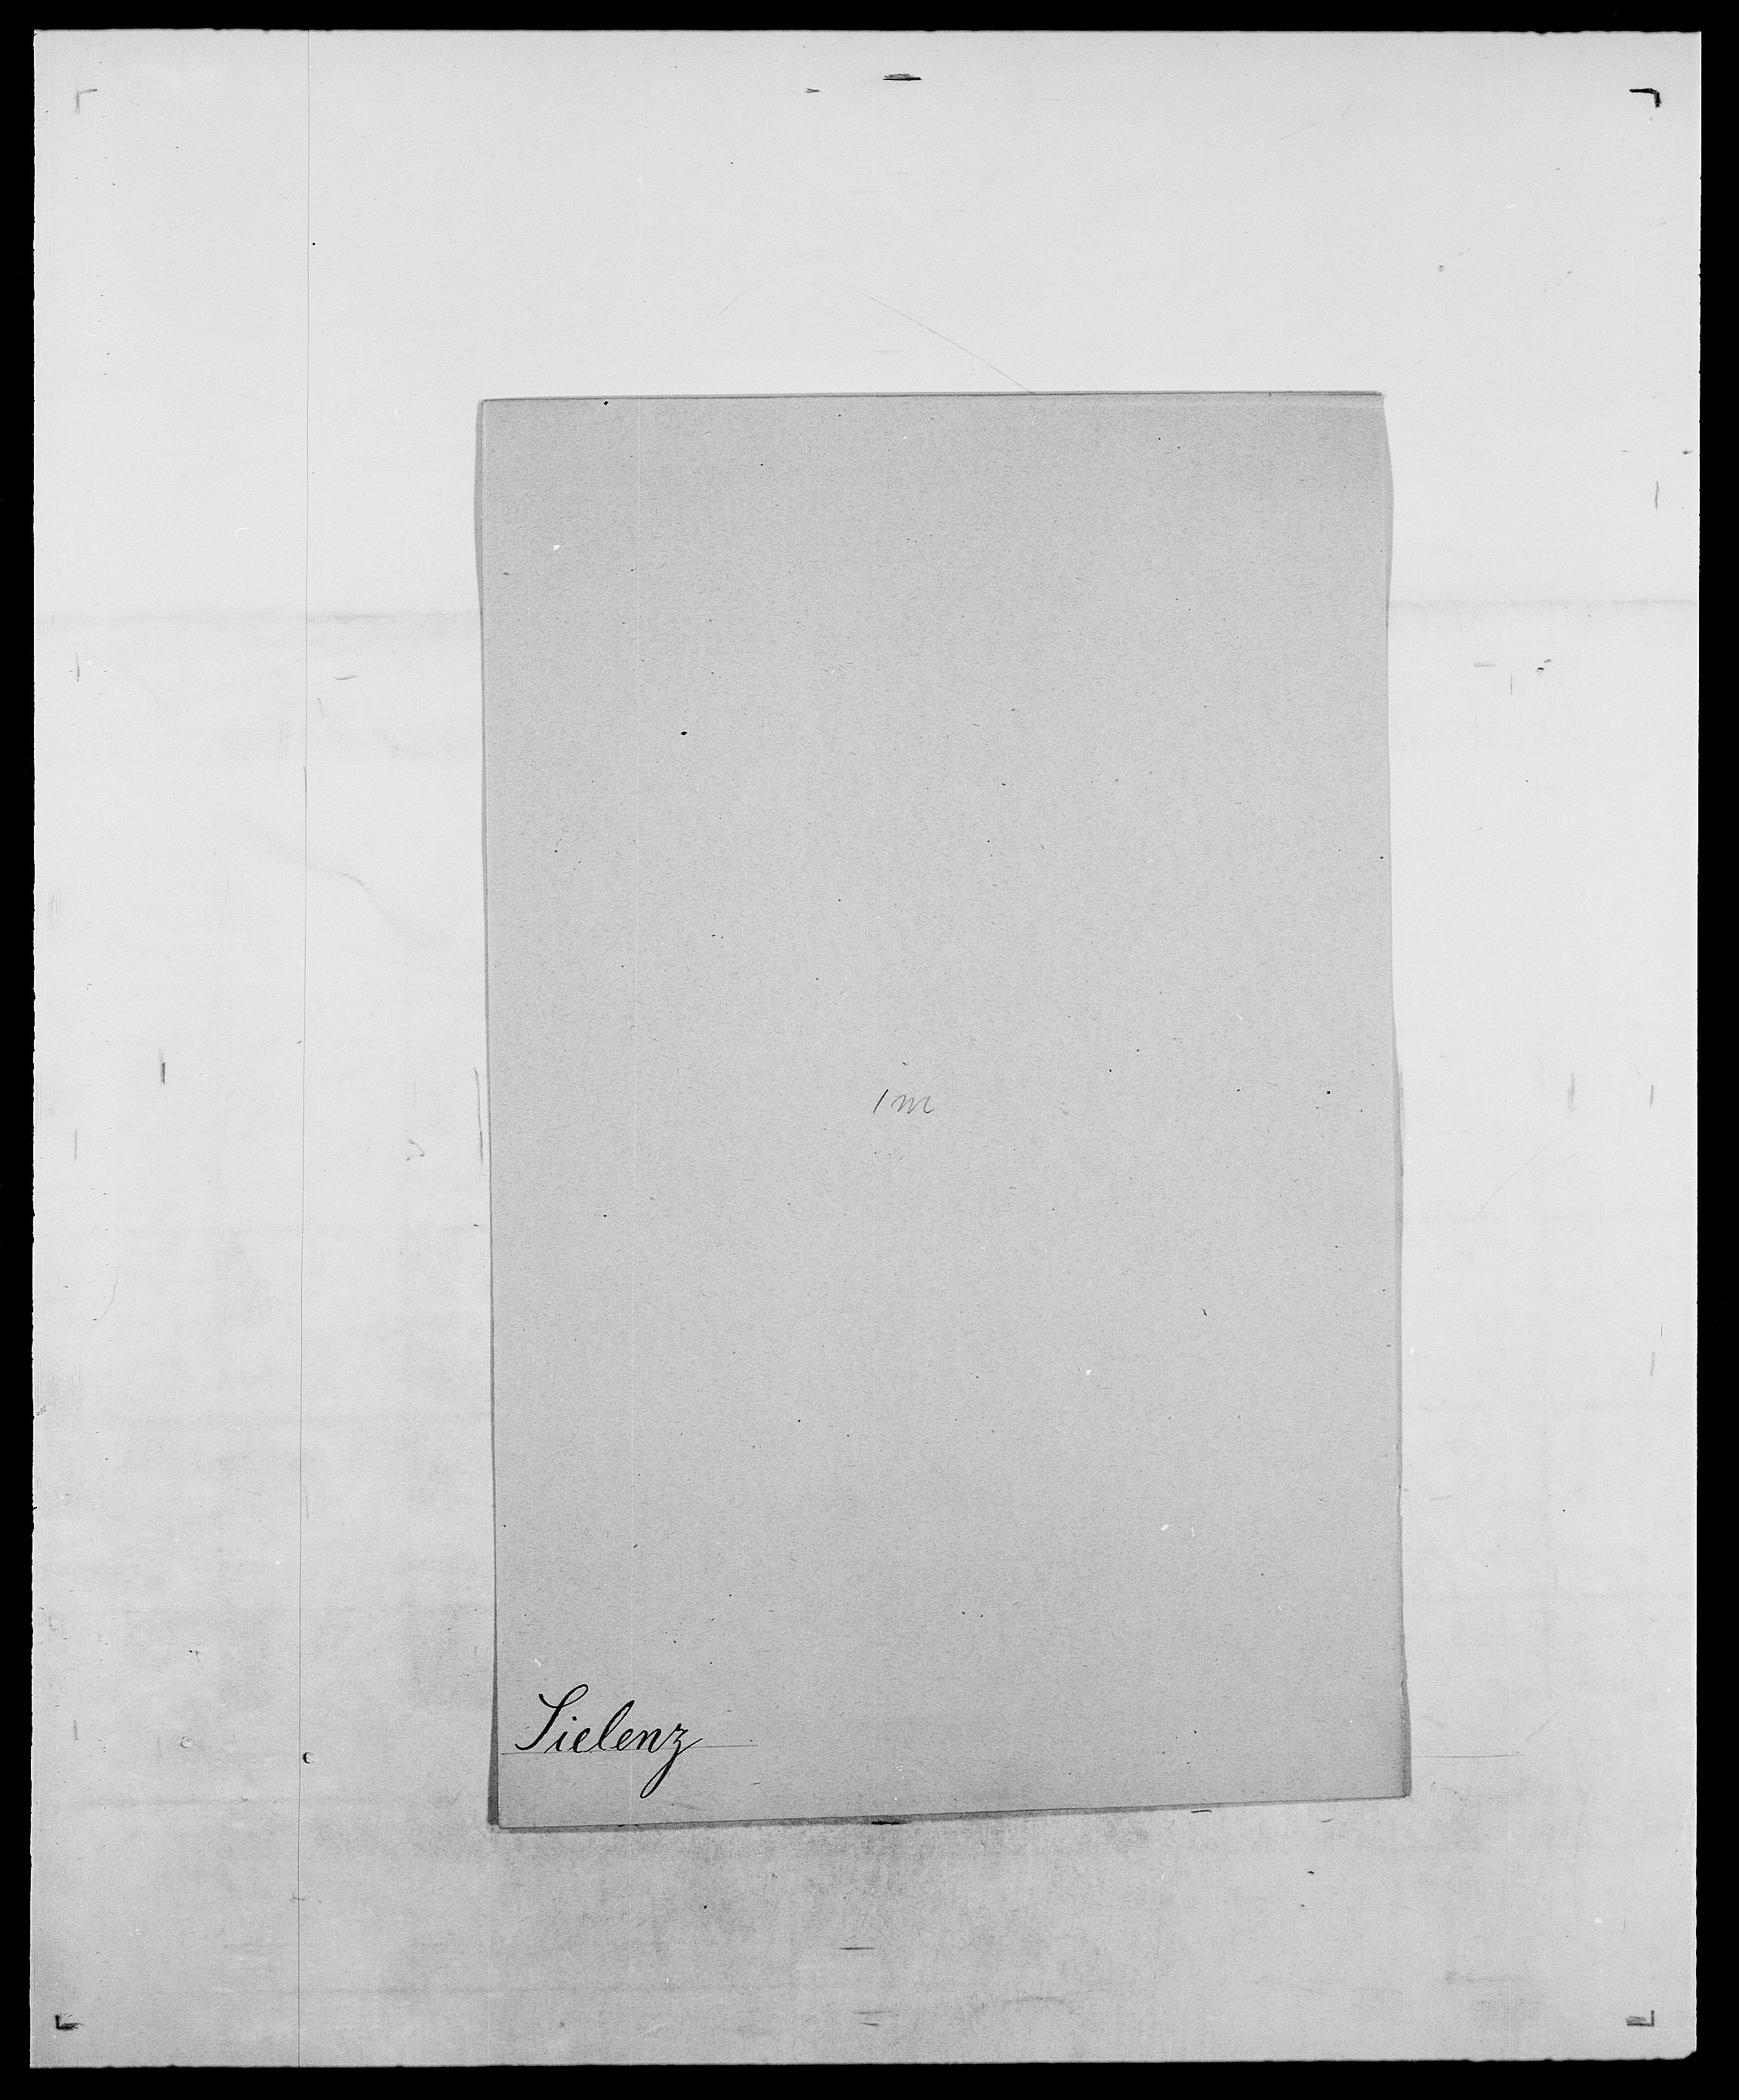 SAO, Delgobe, Charles Antoine - samling, D/Da/L0035: Schnabel - sjetman, s. 767